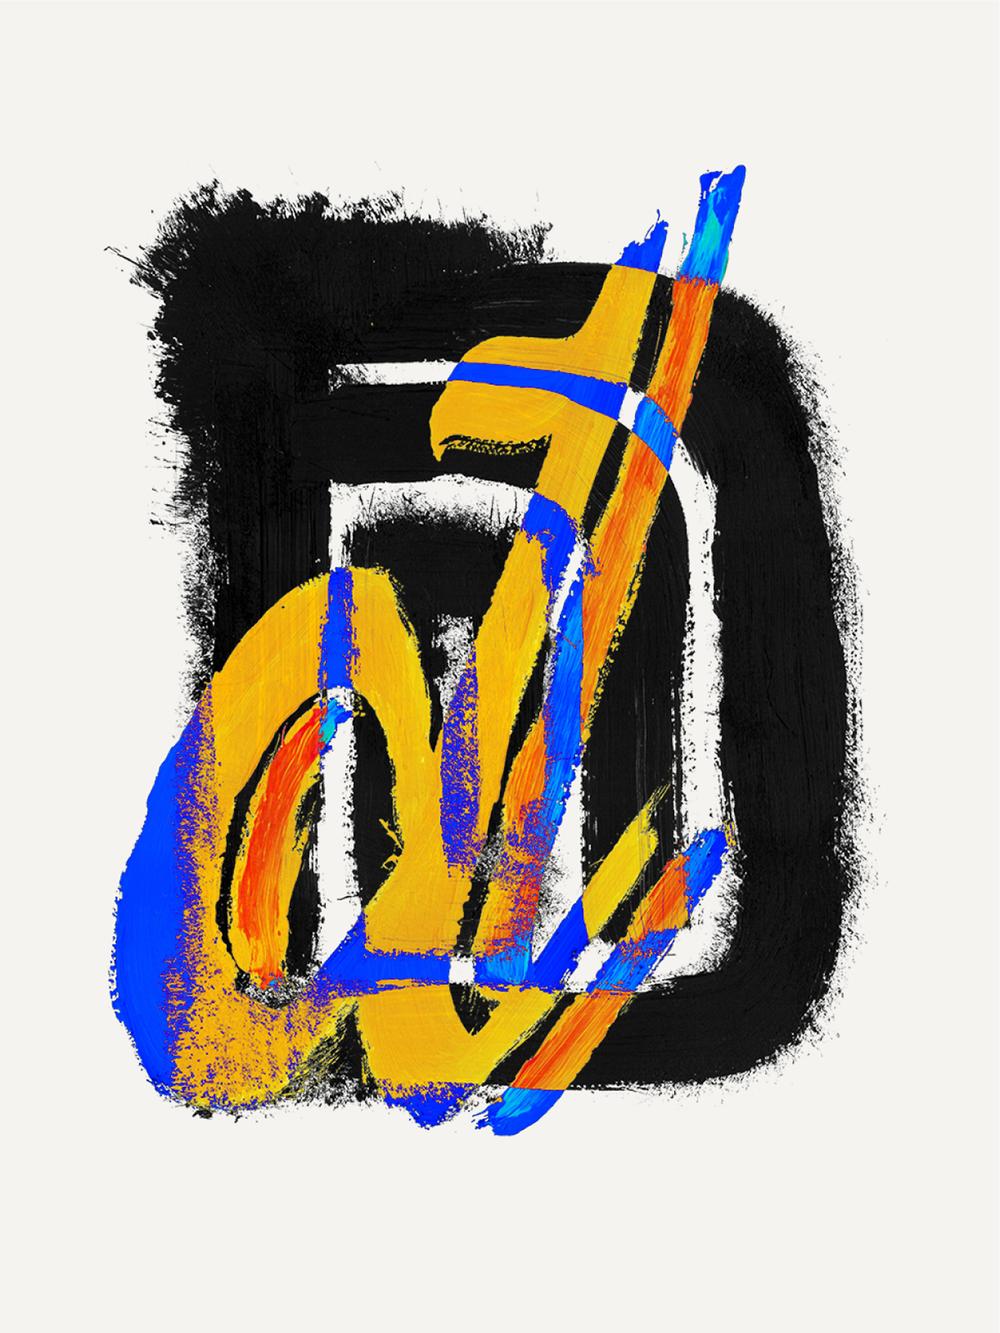 Gestalt_Multistability_FinalPoster-02.png